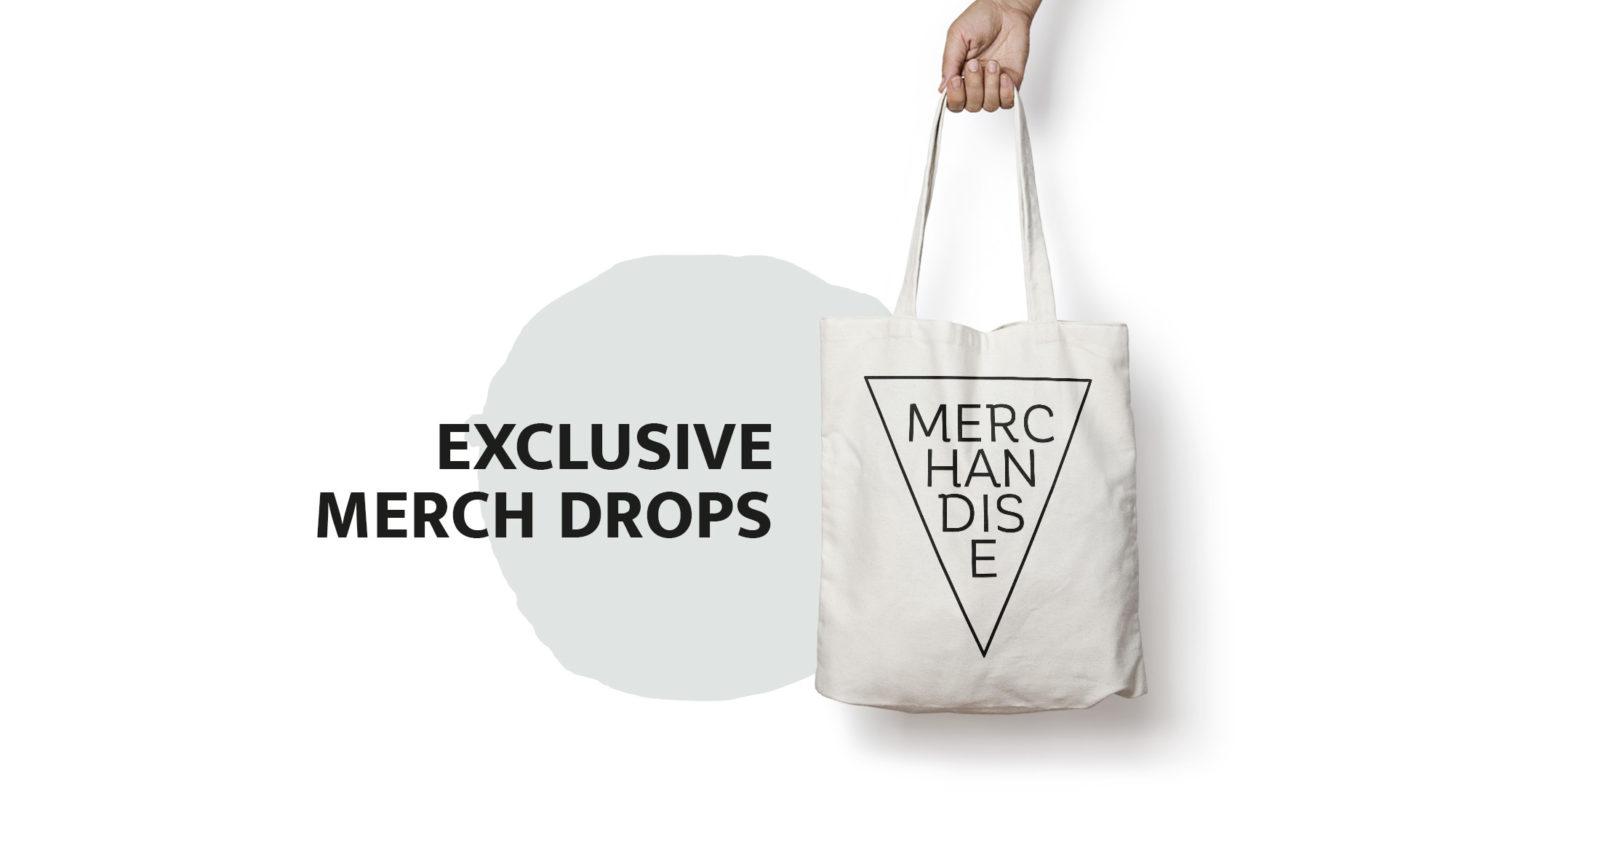 Exclusive Merch Drops